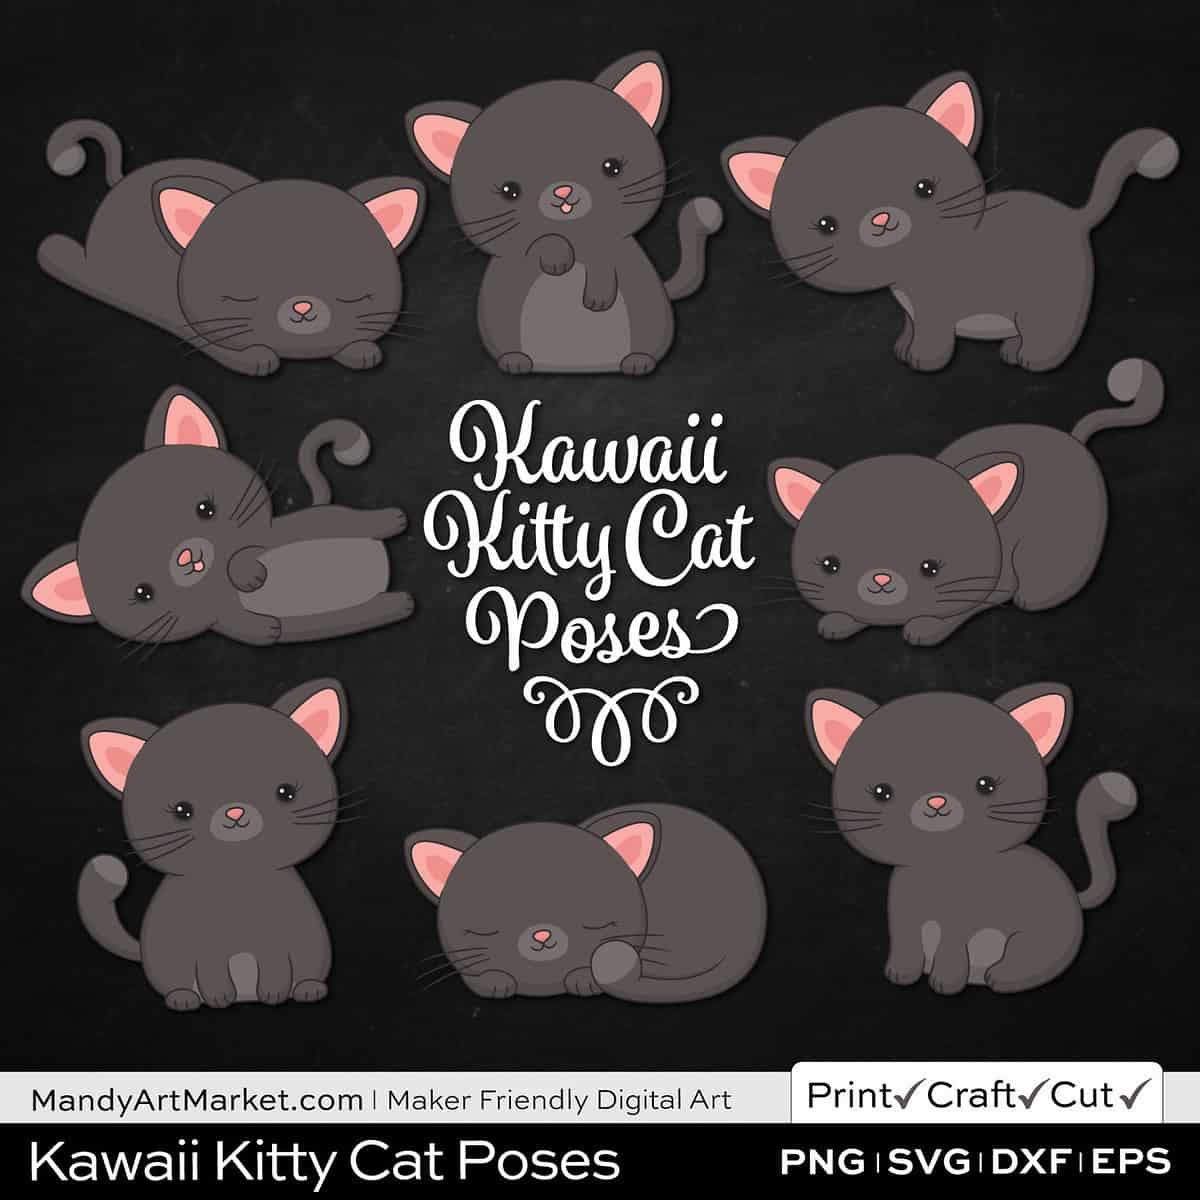 Gunmetal Gray Kawaii Kitty Cat Poses Clipart on Black Background